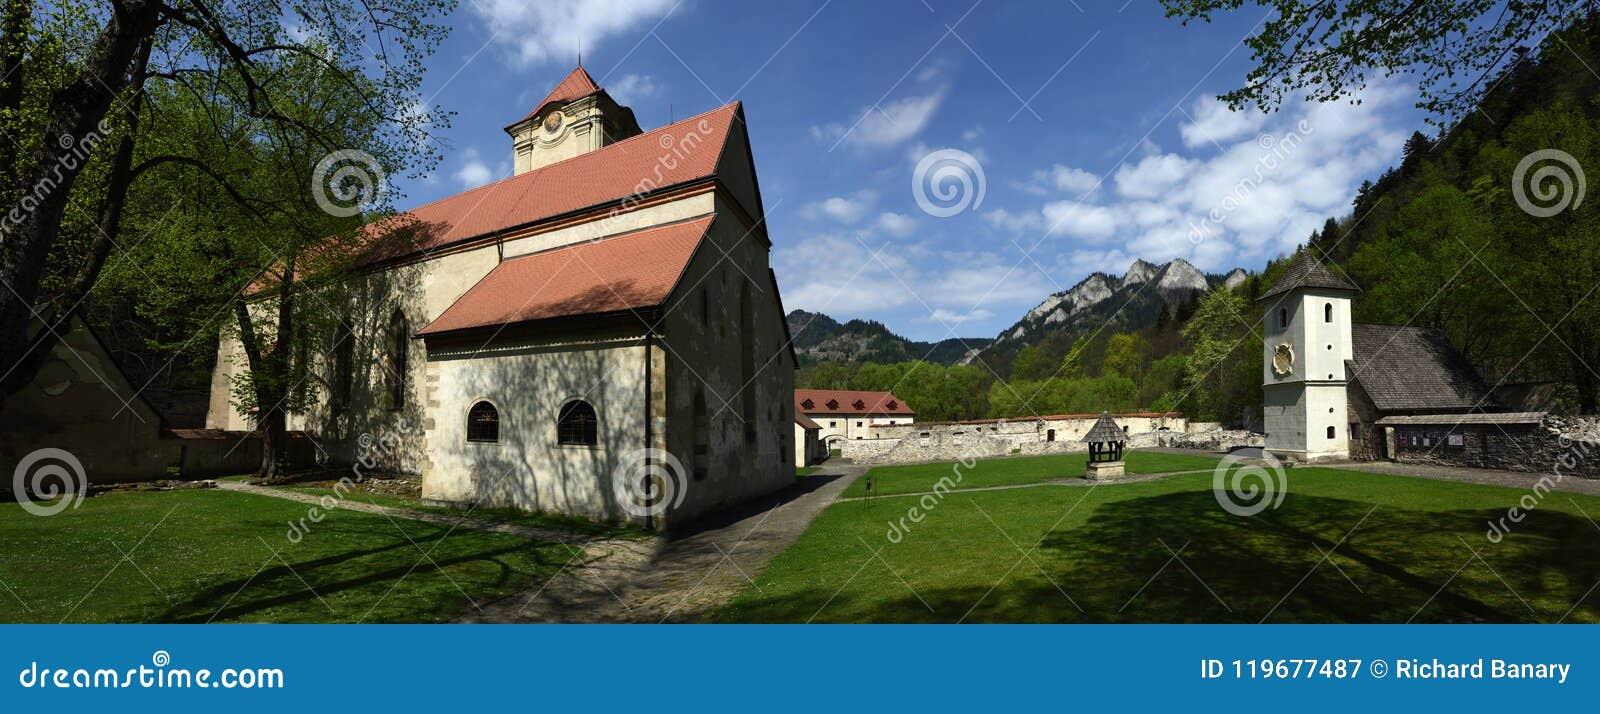 Red Monastery Museum, Spis region, Slovakia